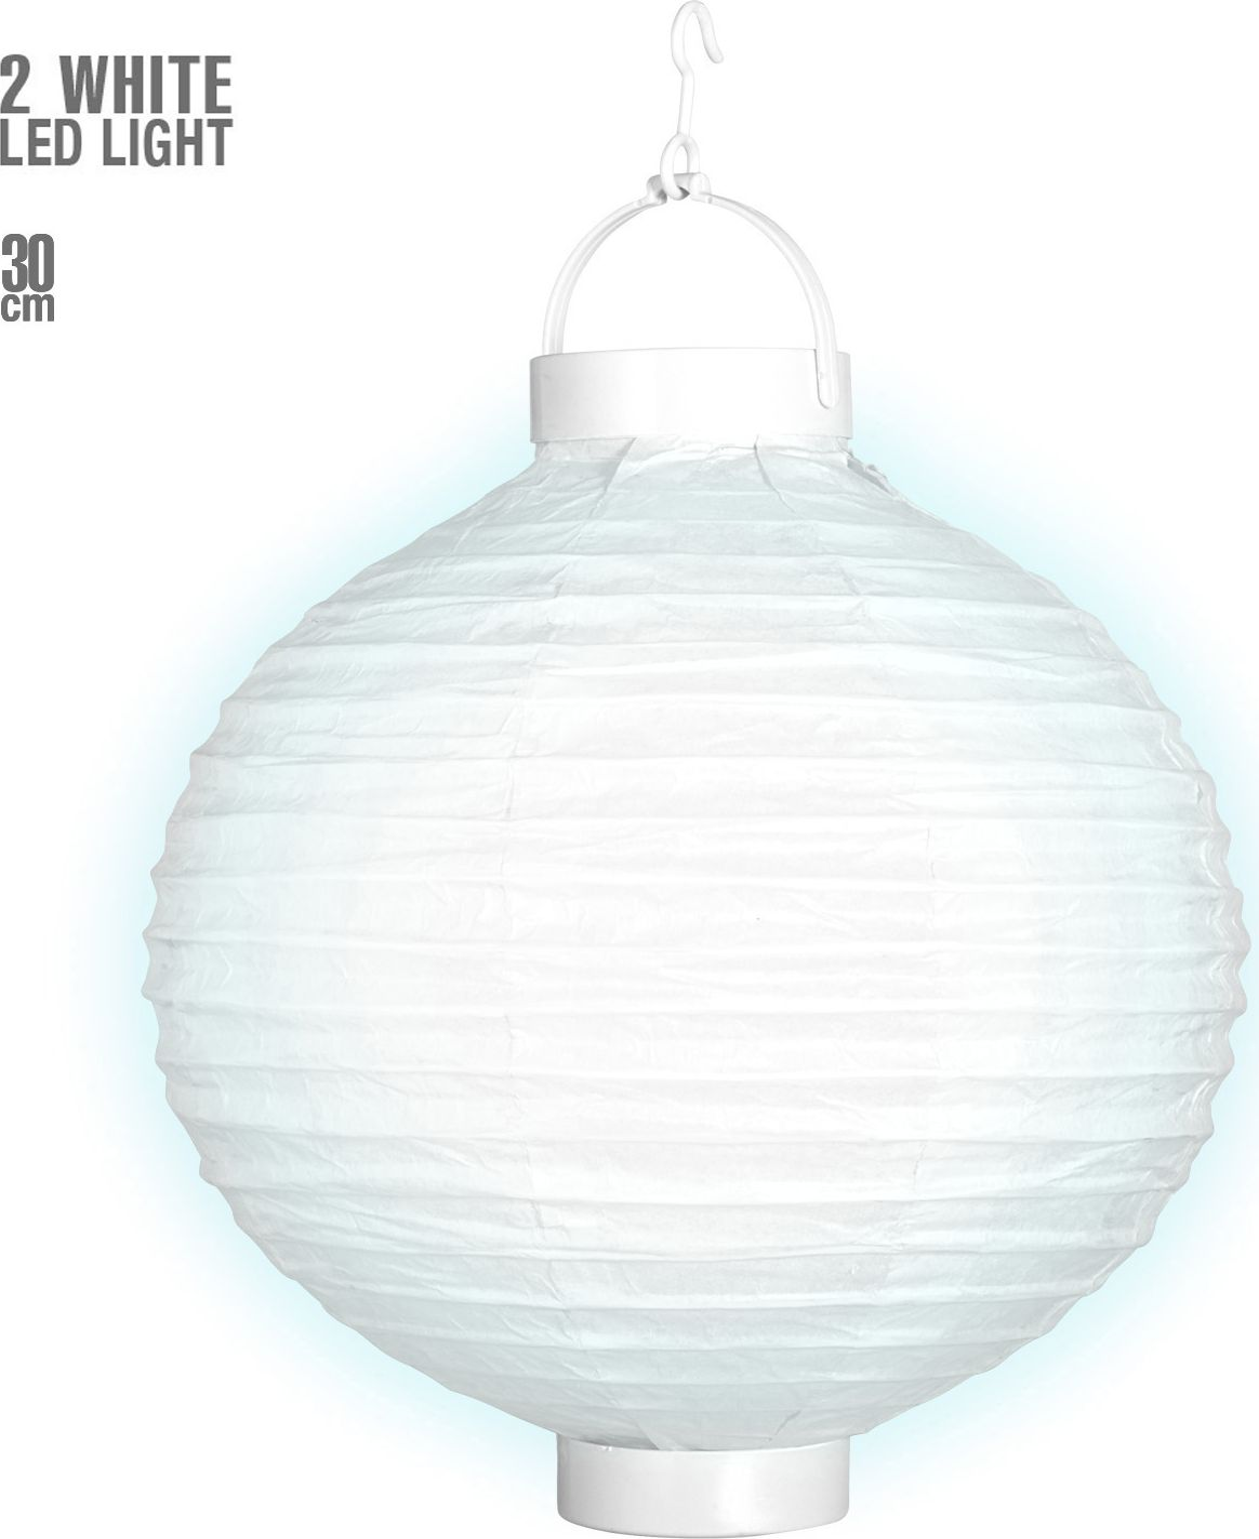 Witte lantaarn met 2 witte LED lichten